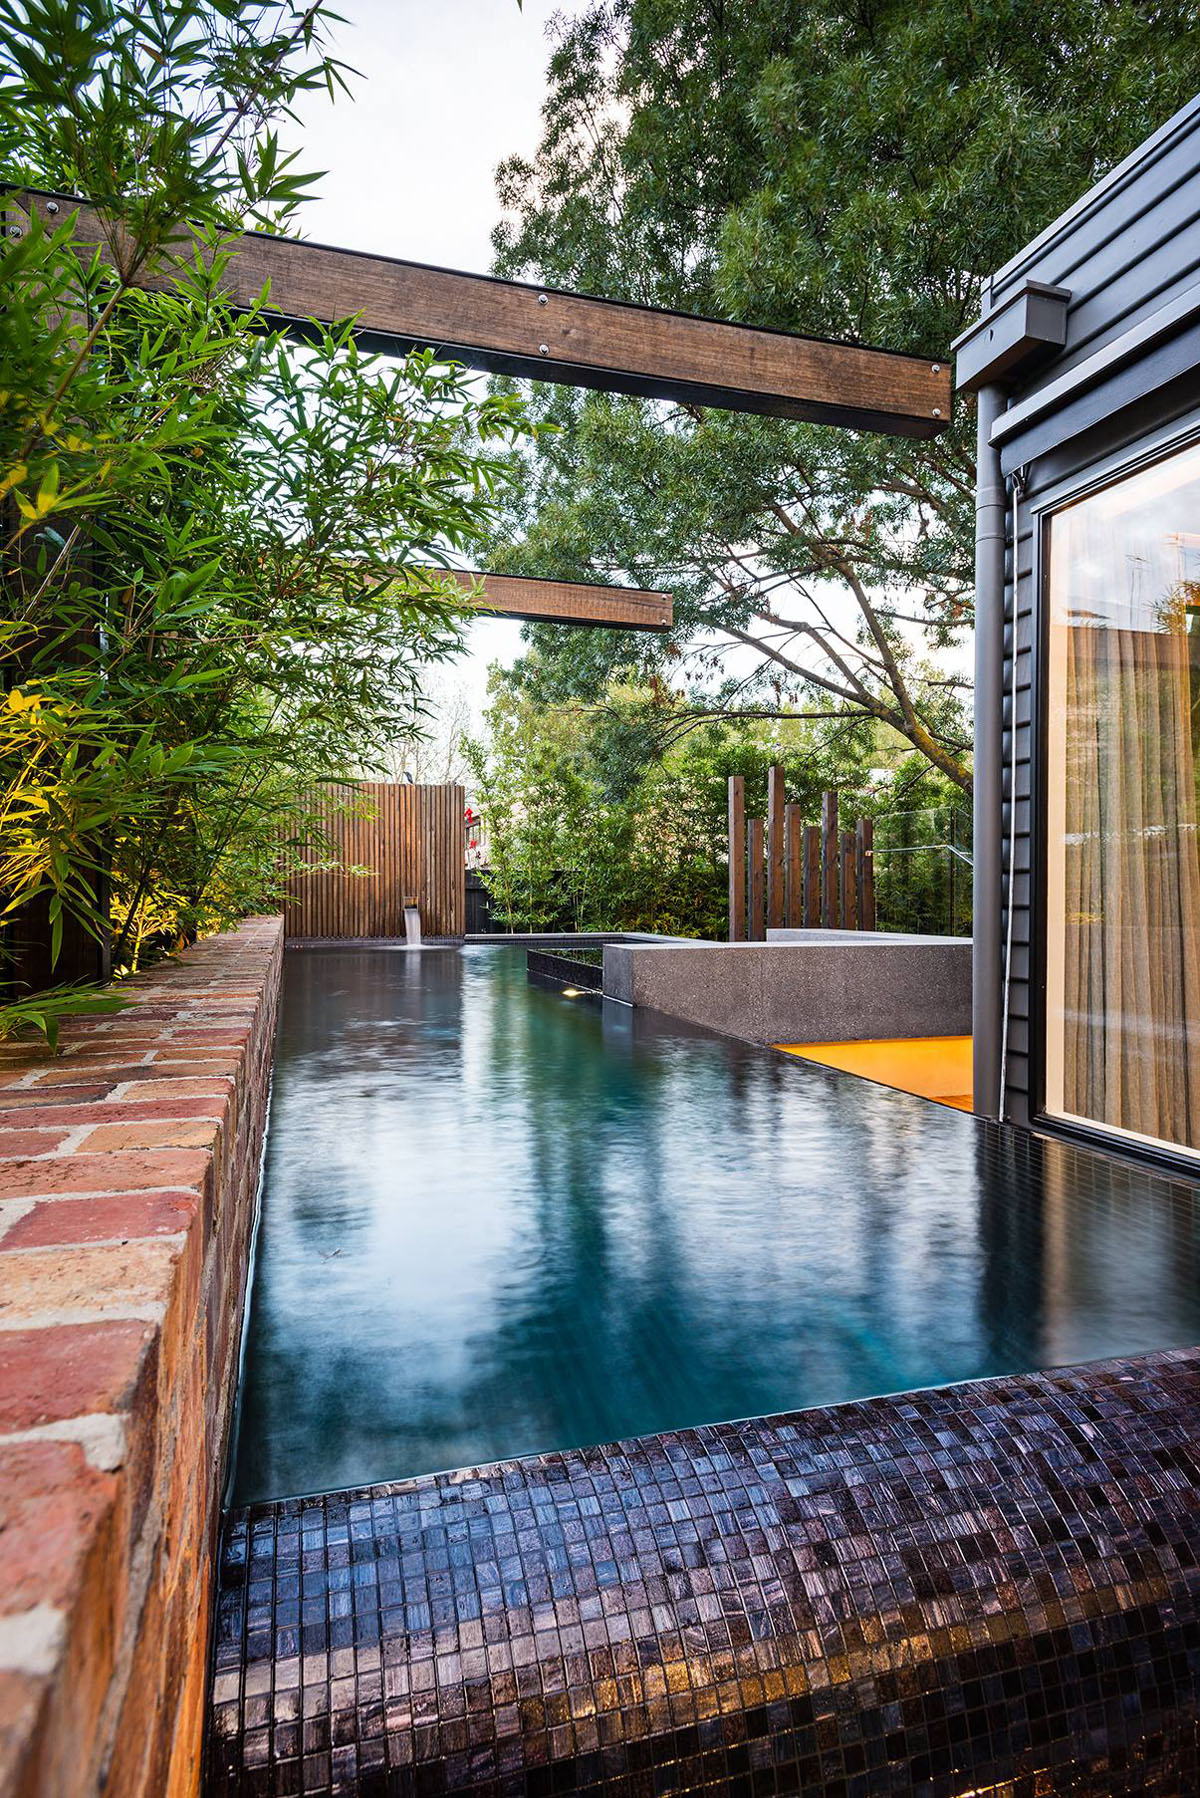 Inspiring Modern Backyard Ideas to Relax You at Home ... on Modern Backyard Ideas With Pool id=53993